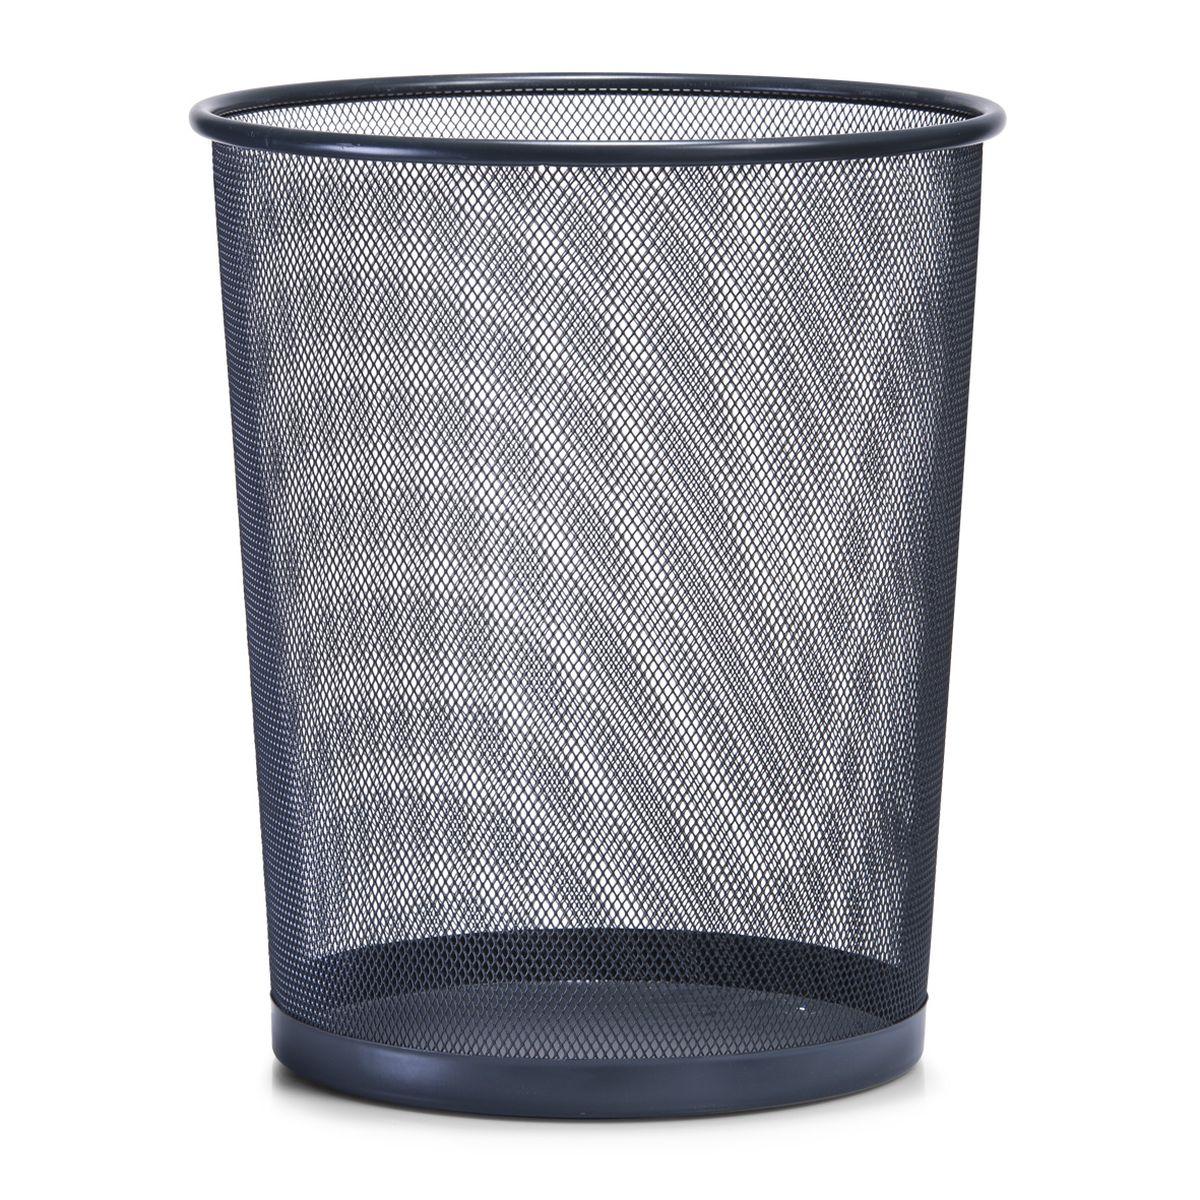 Корзина для мусора Zeller, 29,5 х 35 см корзина для мусора kassatex kensington aks wb